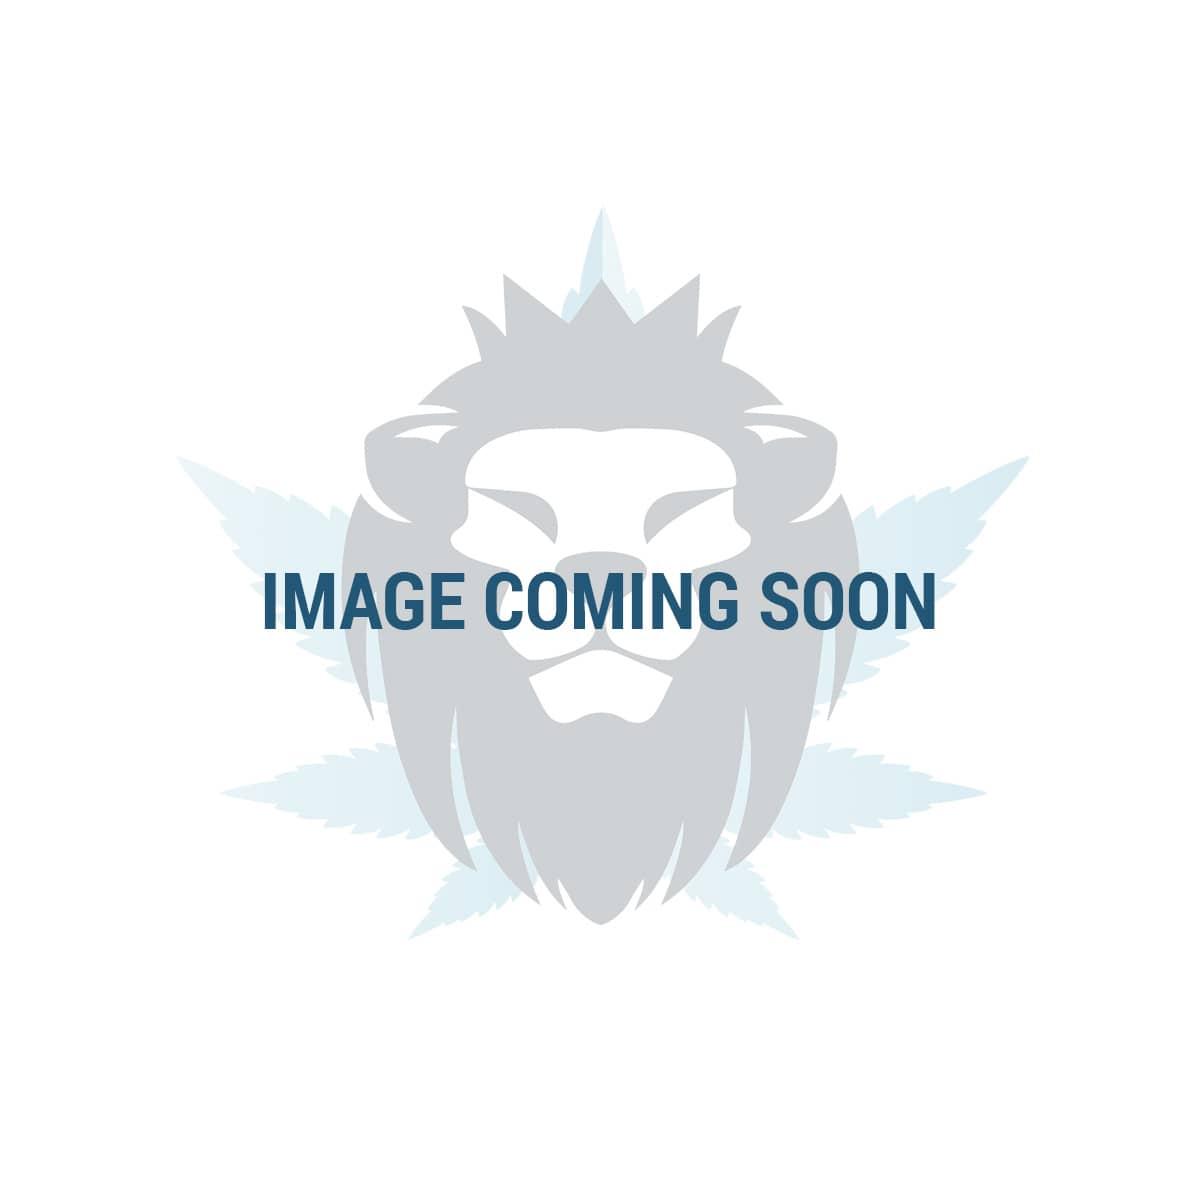 Handle grinder - Black